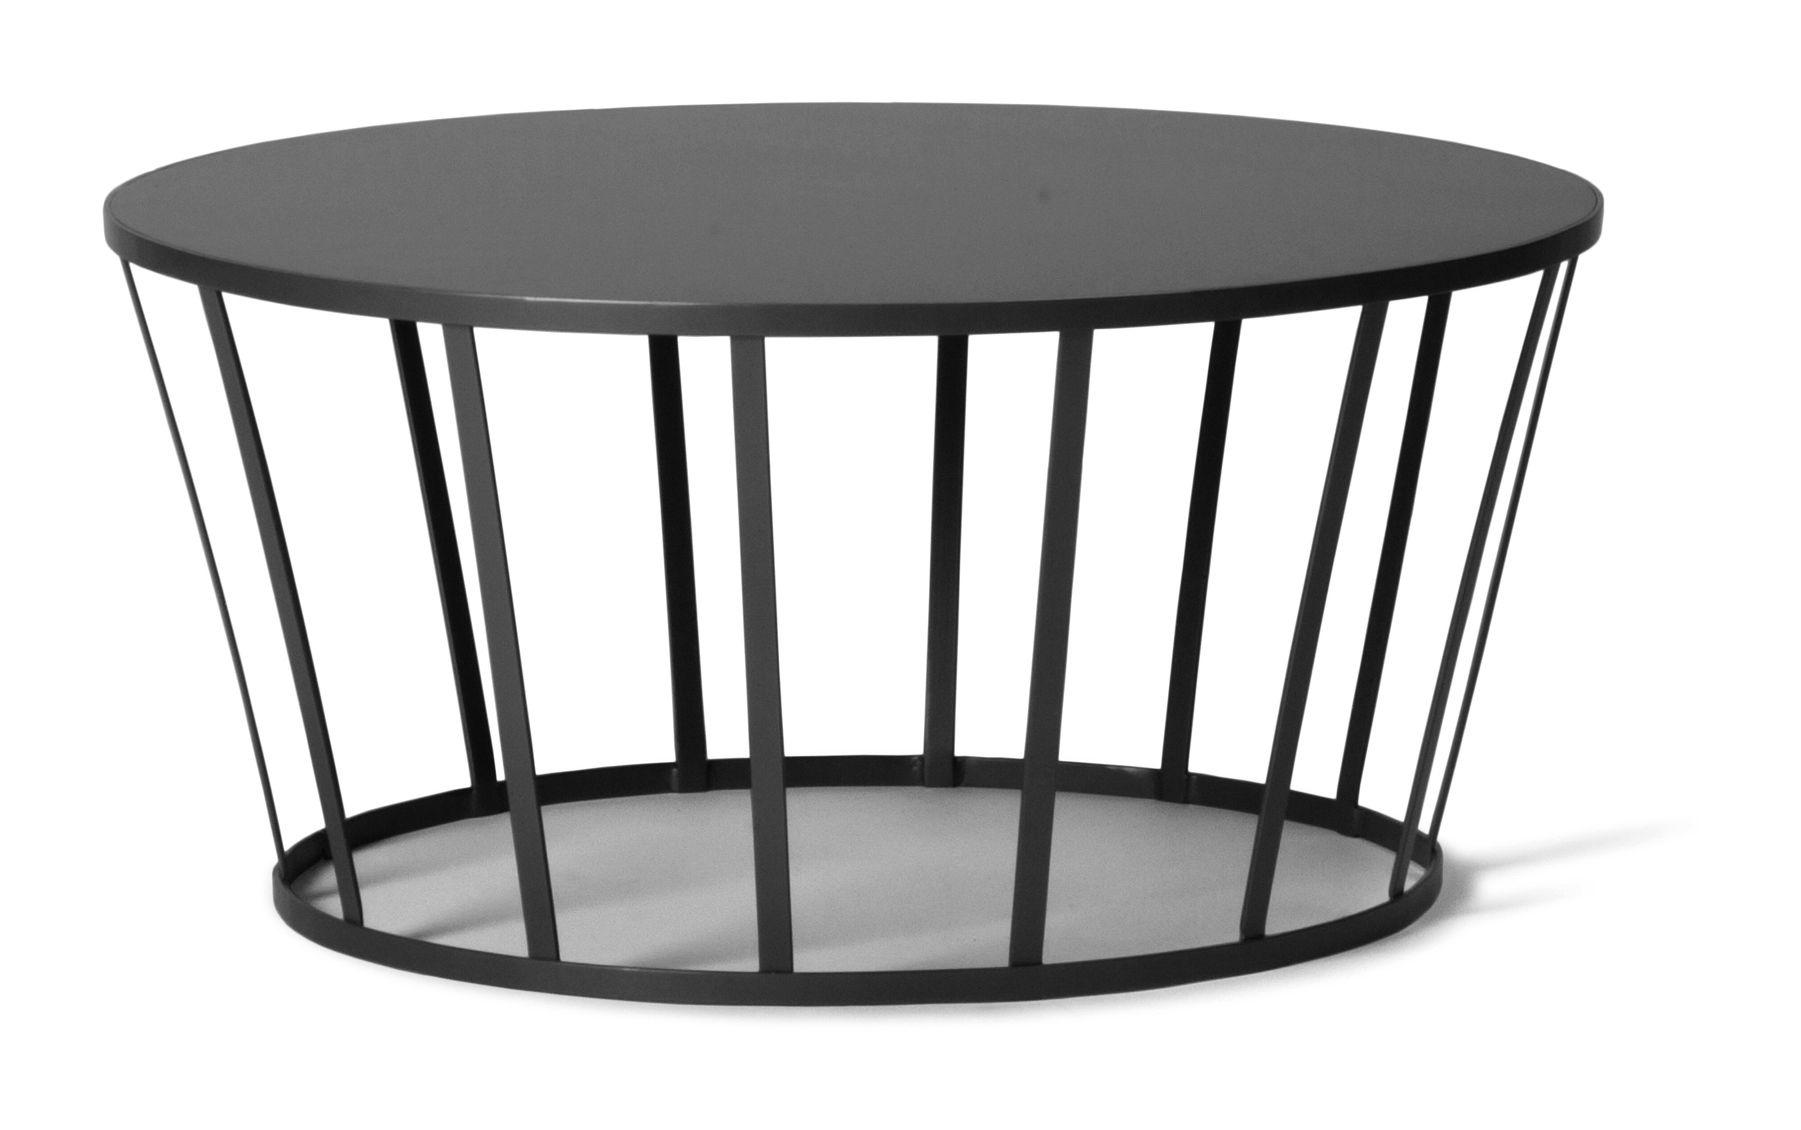 Arredamento - Tavolini  - Tavolino Hollo - H 33 cm di Petite Friture - H 33 cm - Antracite - Acciaio inox vernice epossidica